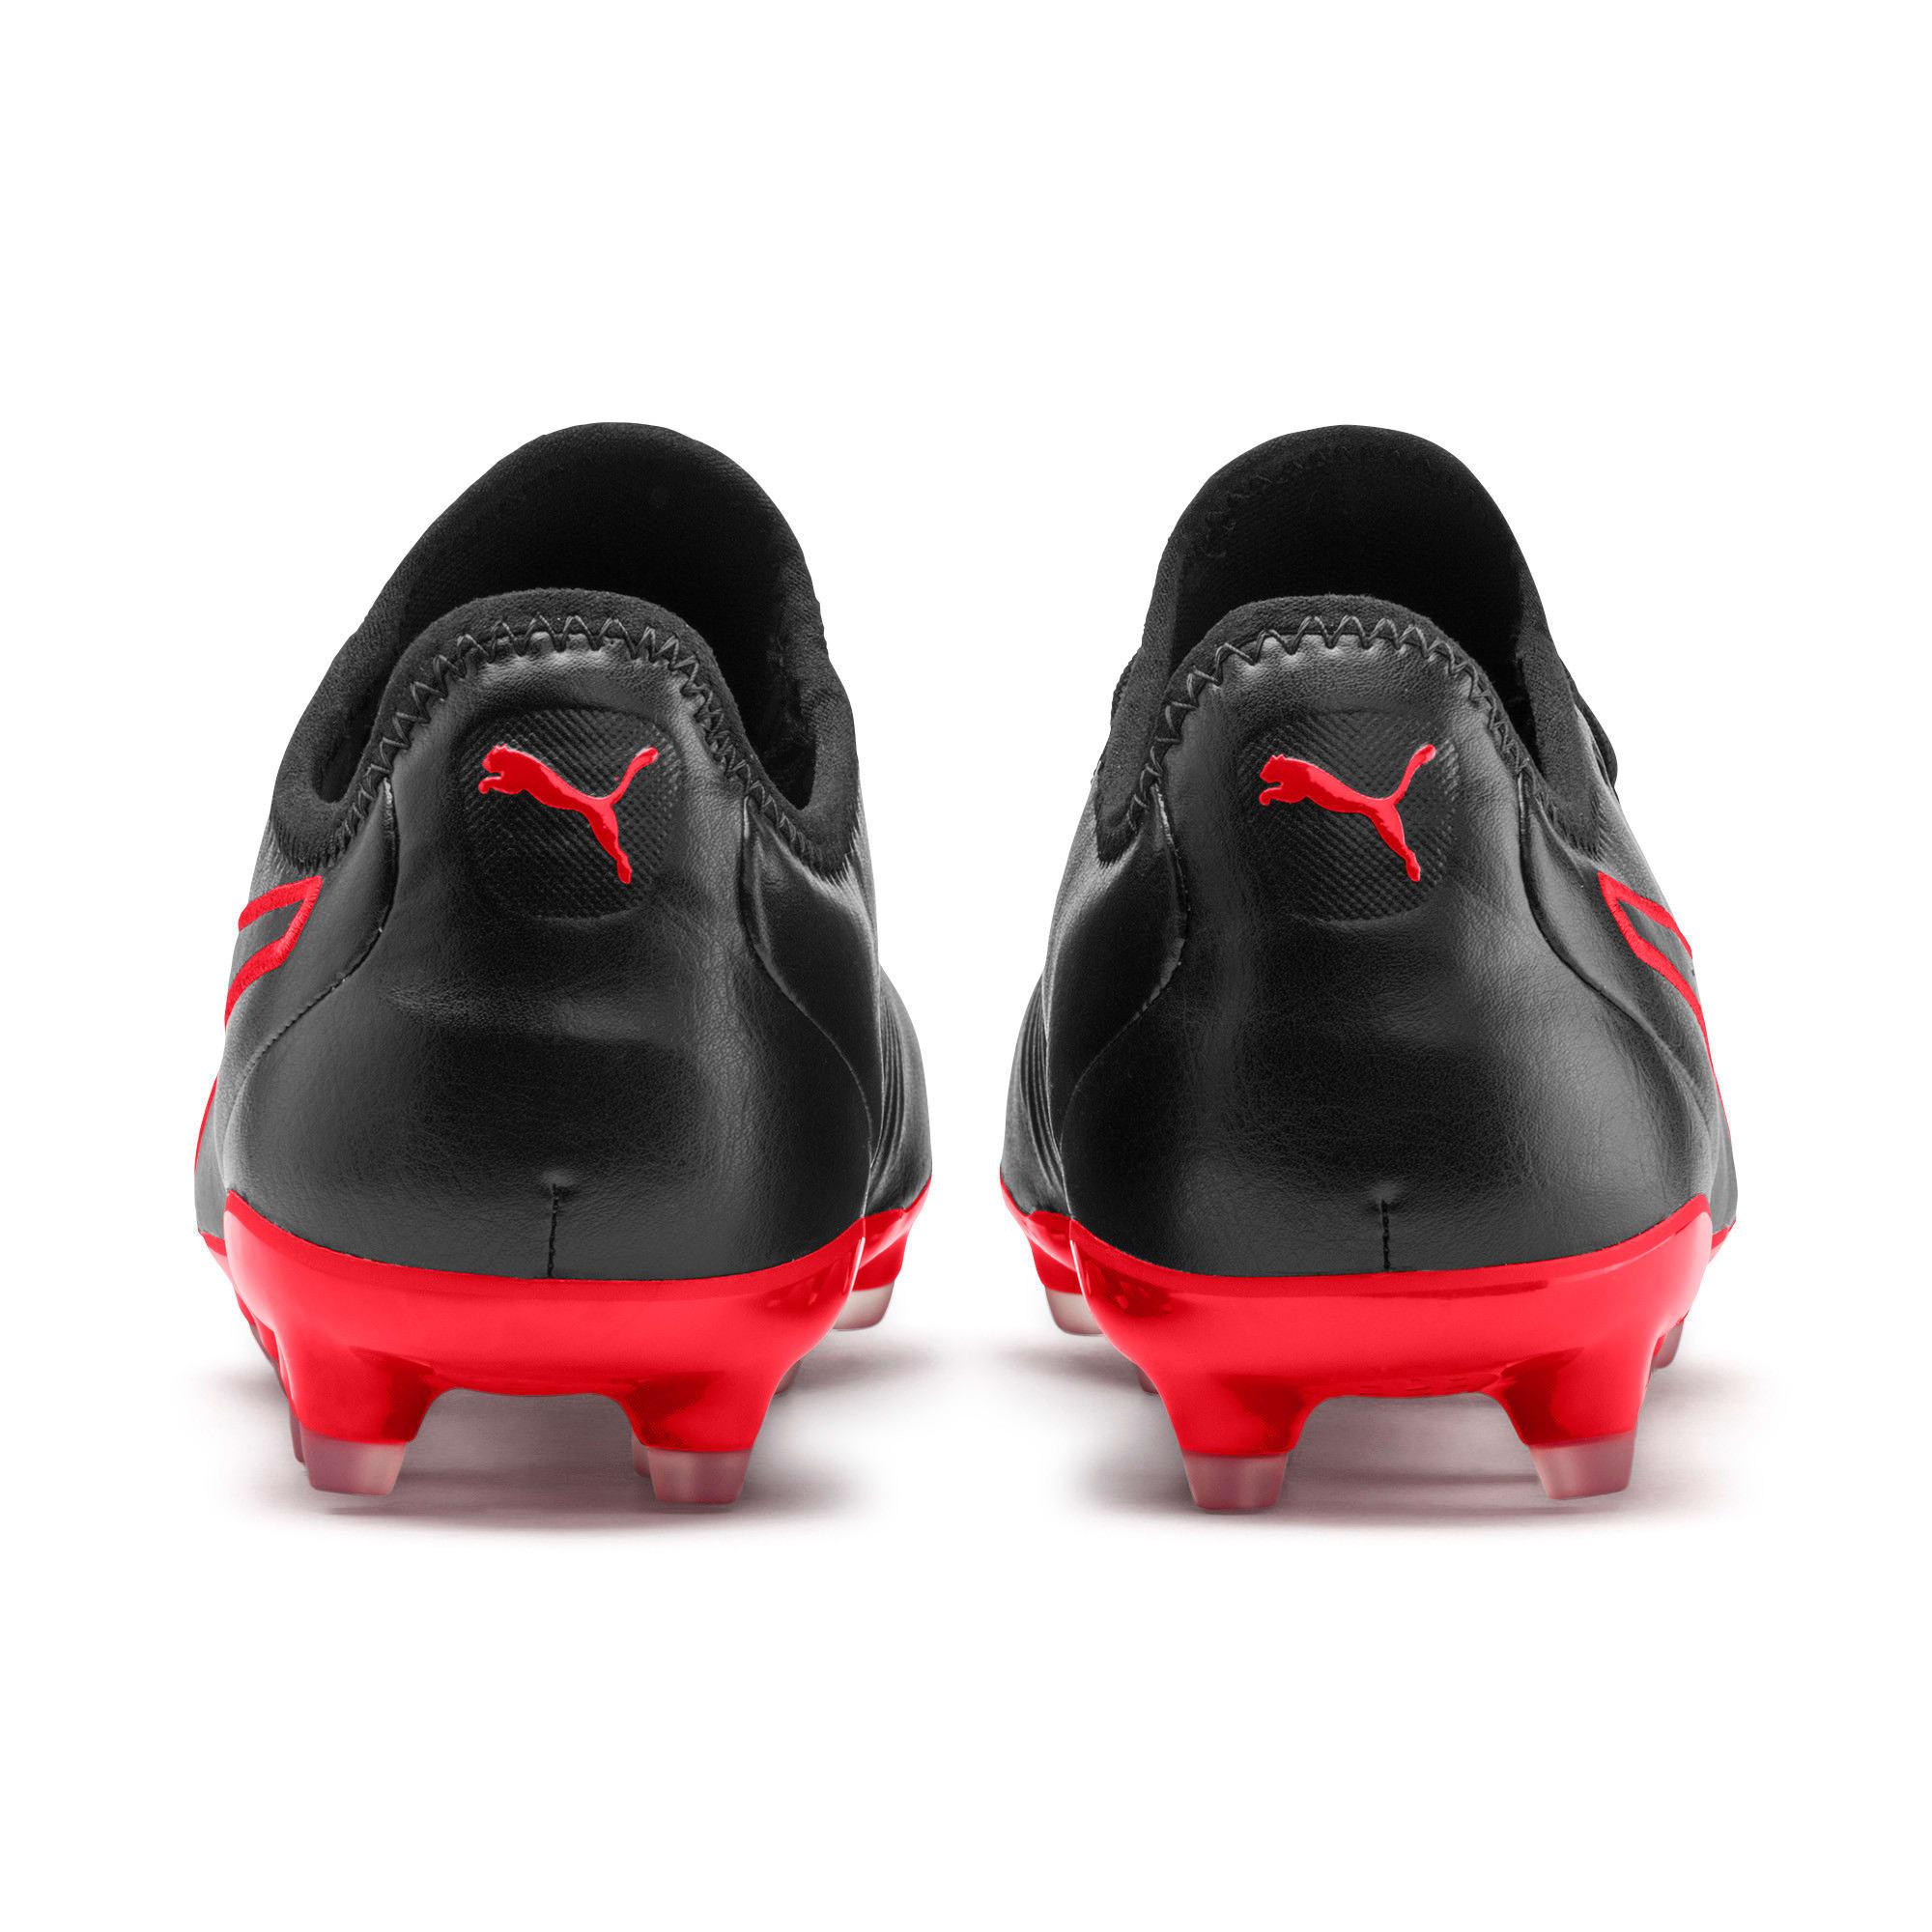 Thumbnail 4 of King Pro FG Soccer Cleats, Puma Black-High Risk Red, medium